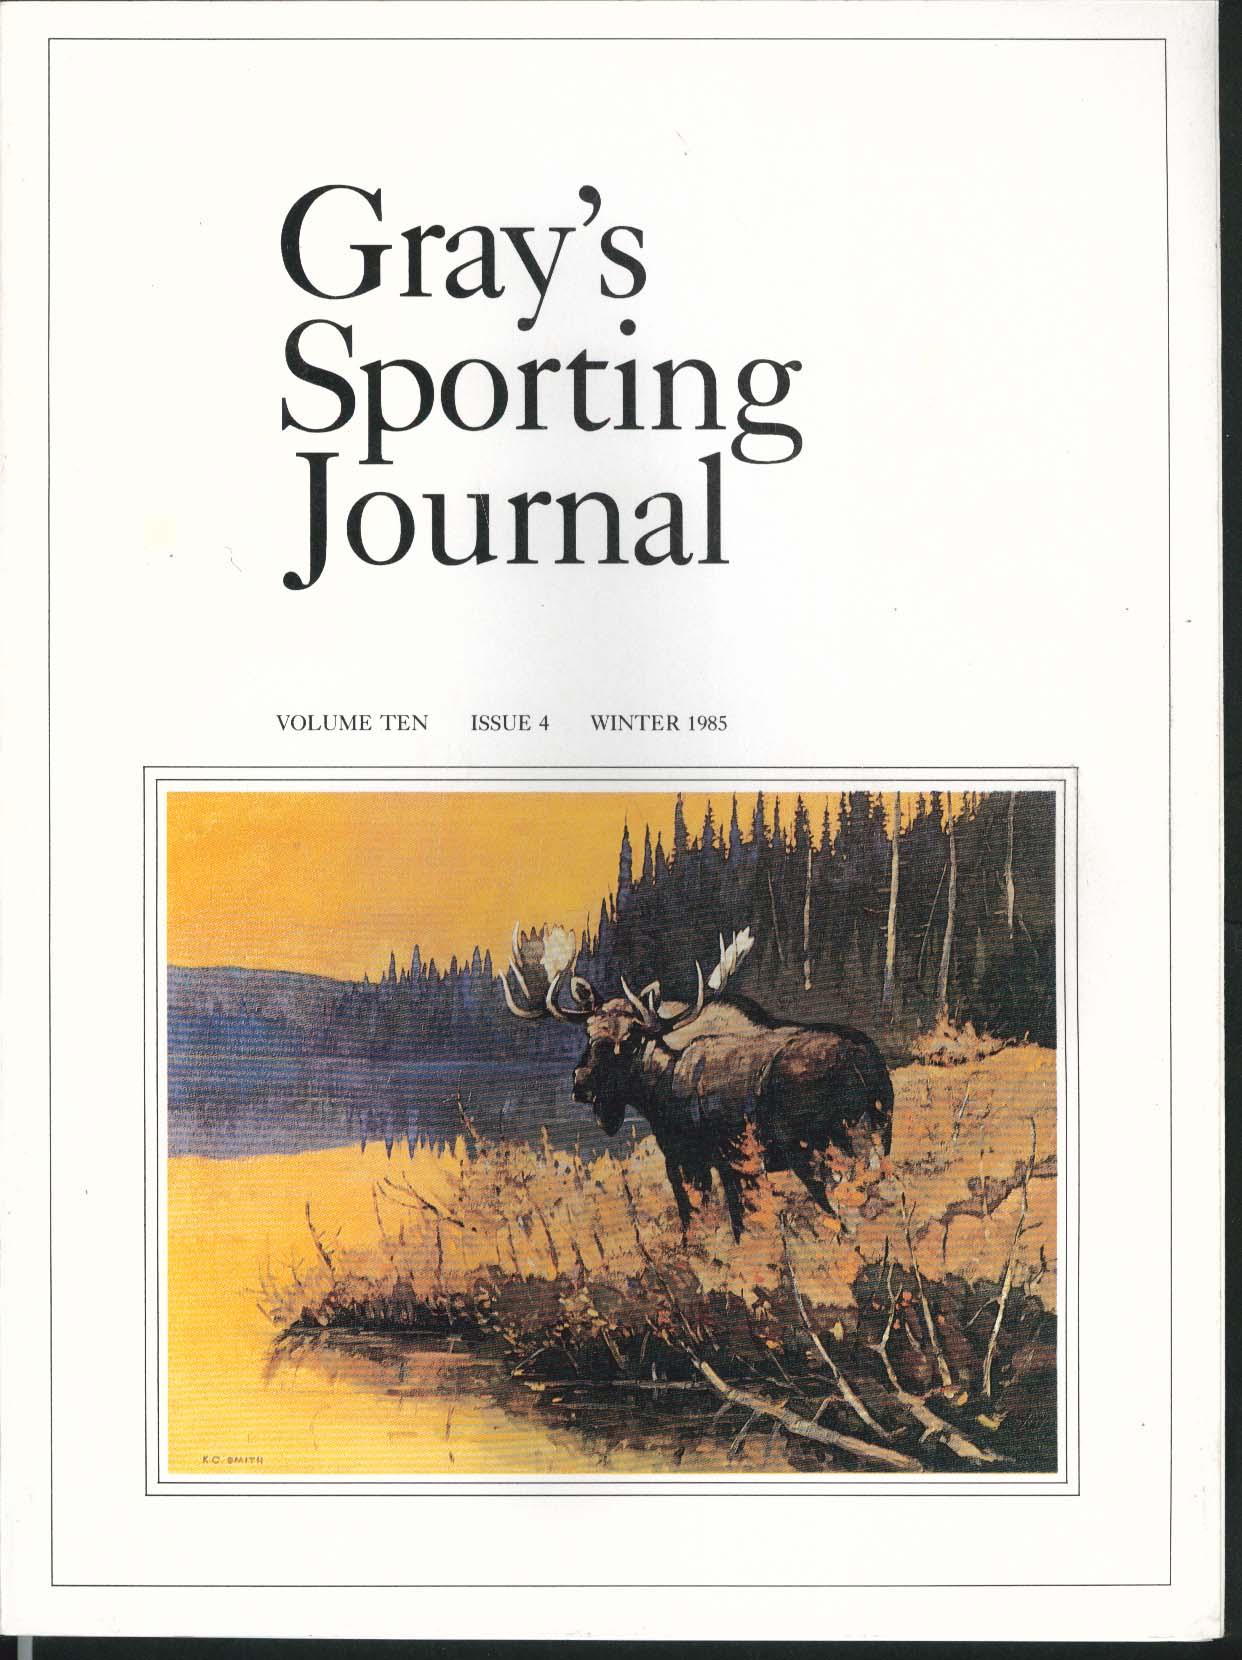 GRAY'S SPORTING JOURNAL Vol 10 #4 Witchfire H H Gordon Winter 1985